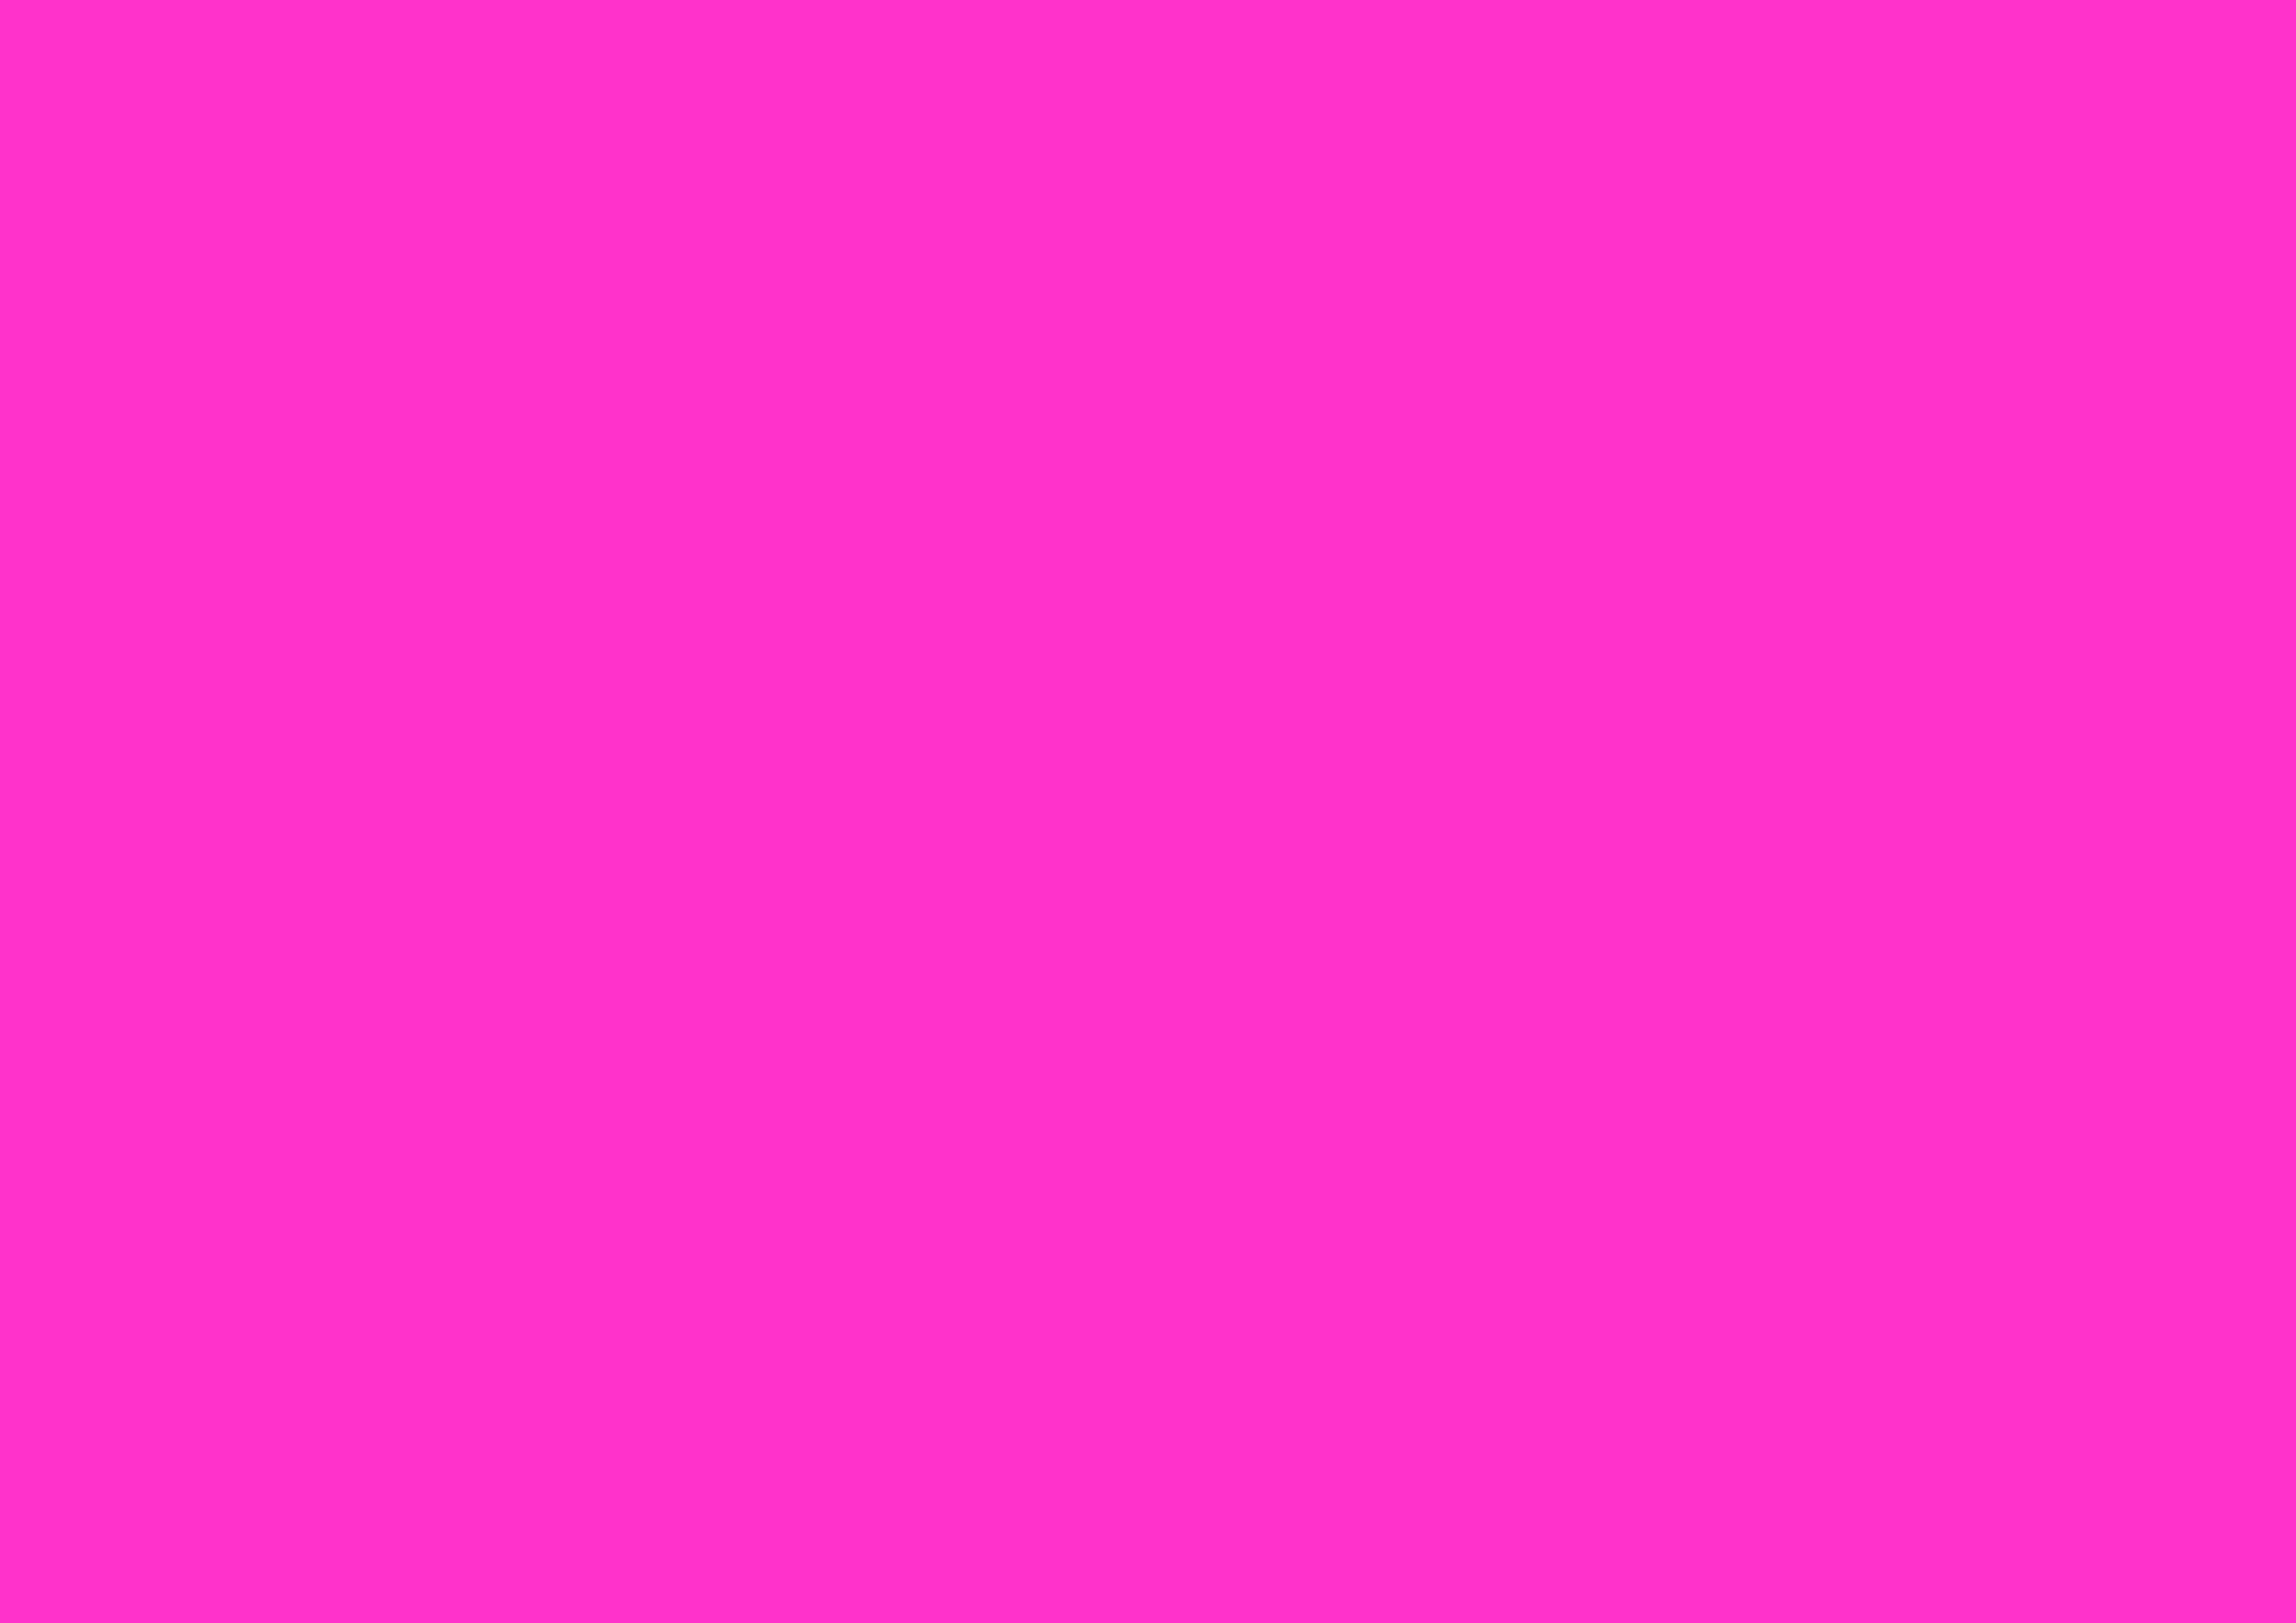 3508x2480 Razzle Dazzle Rose Solid Color Background